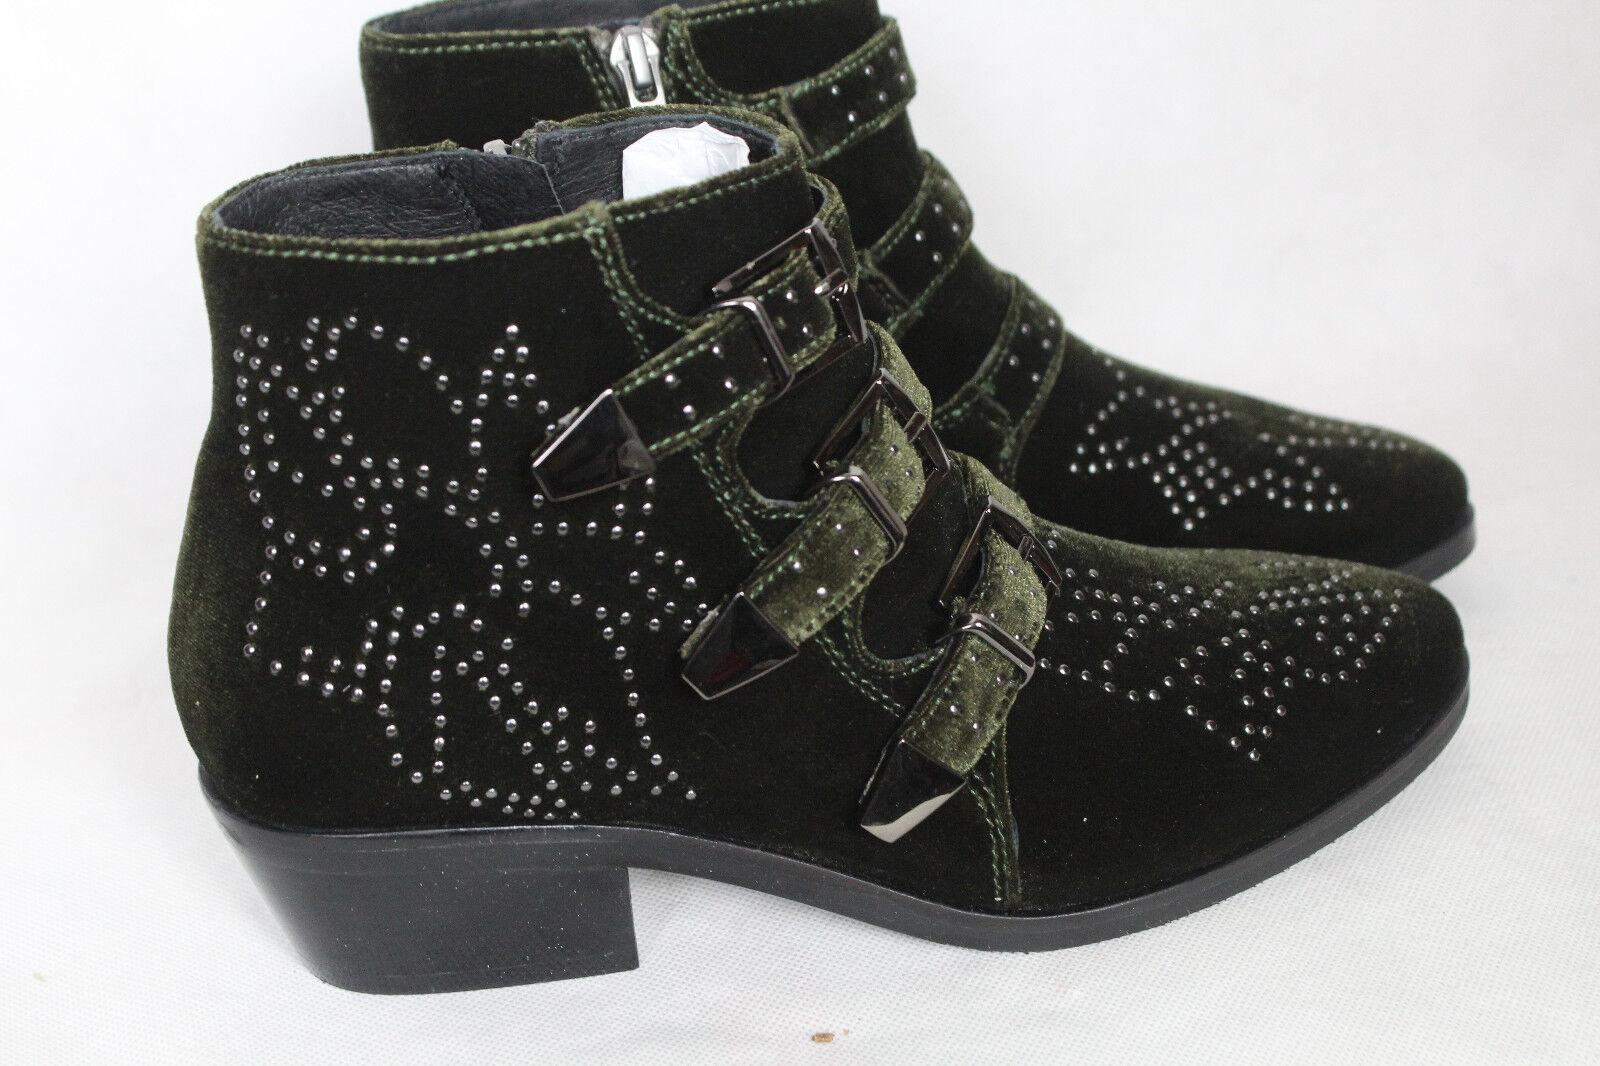 Bruno premi terciopelo zapatos botines, señora neu, LP